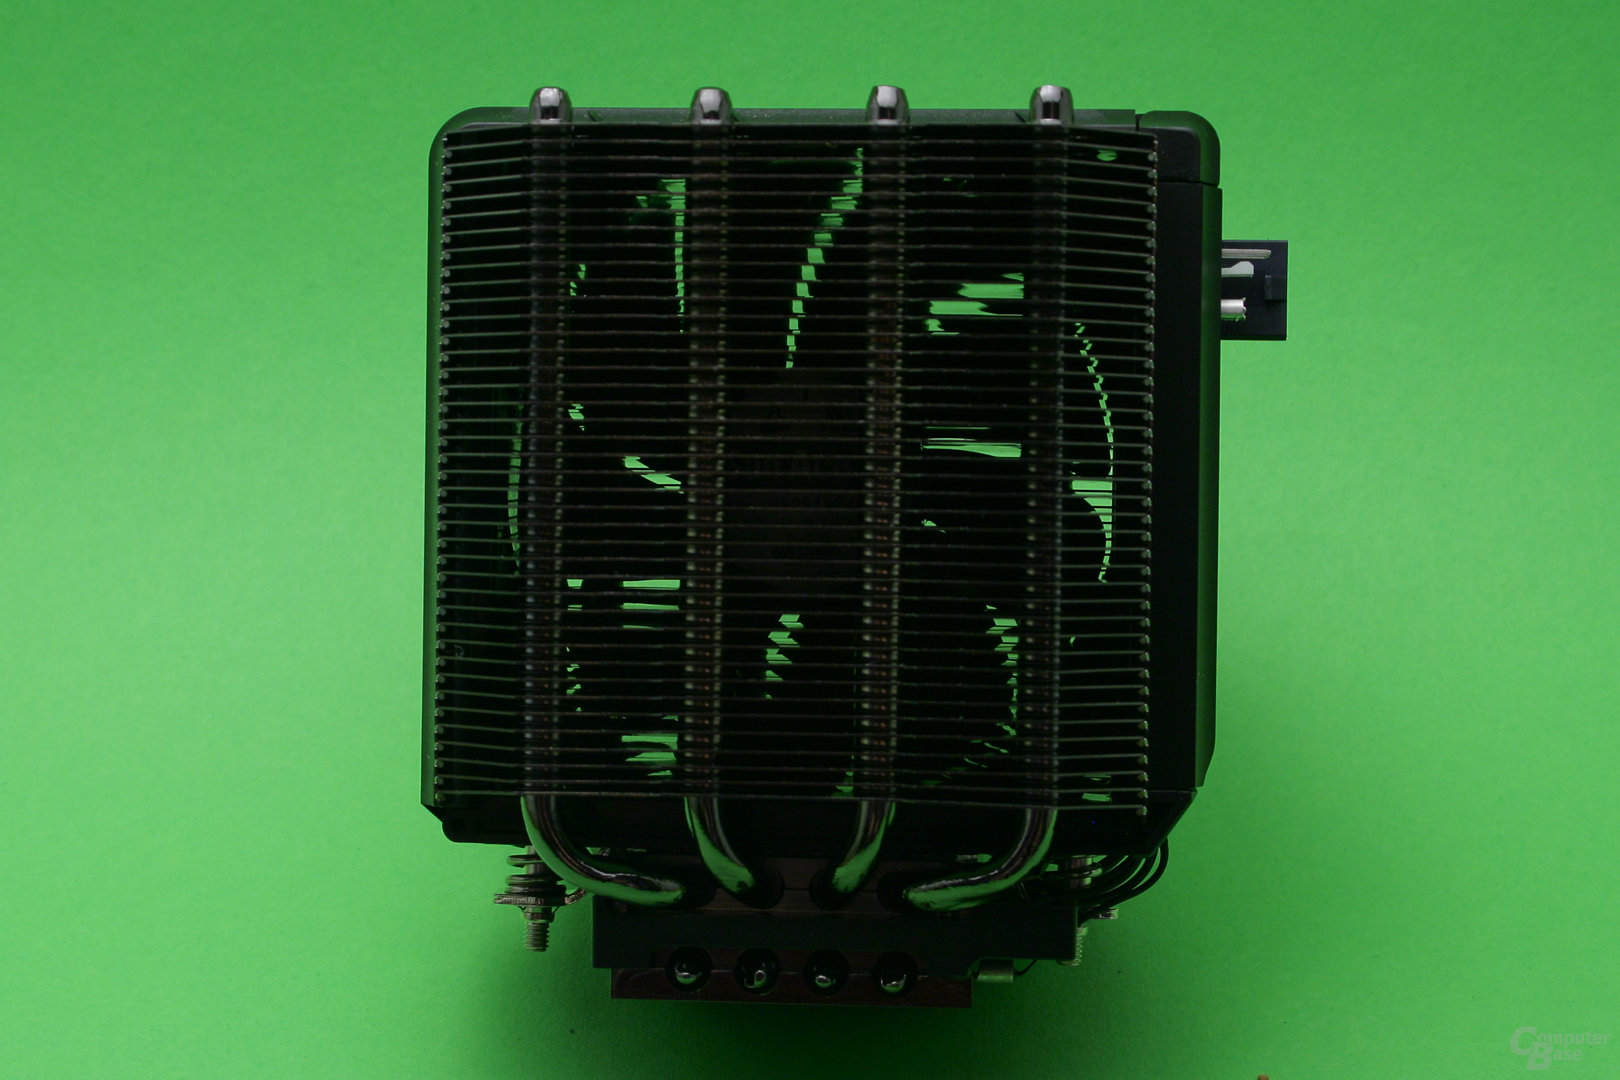 Phononic Hex 2.0: 92mm-Lüfter zwischen den Radiatoren